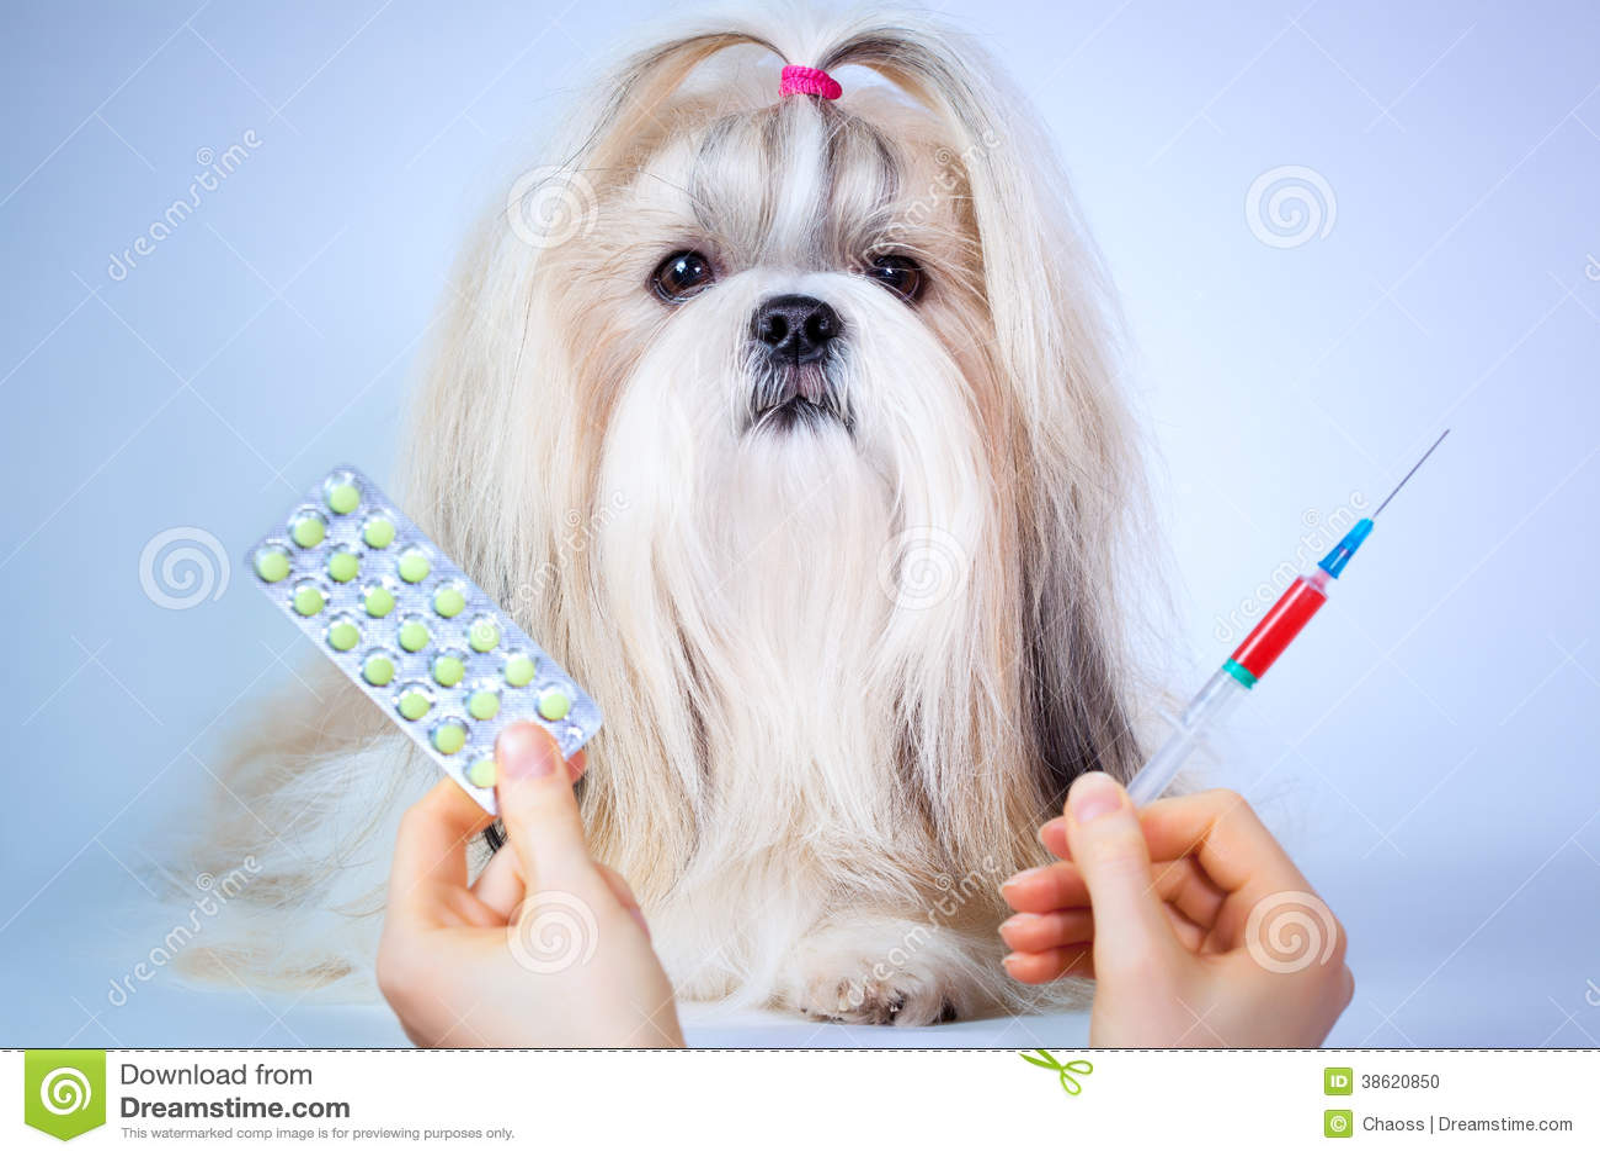 Shih tzu dog treatment